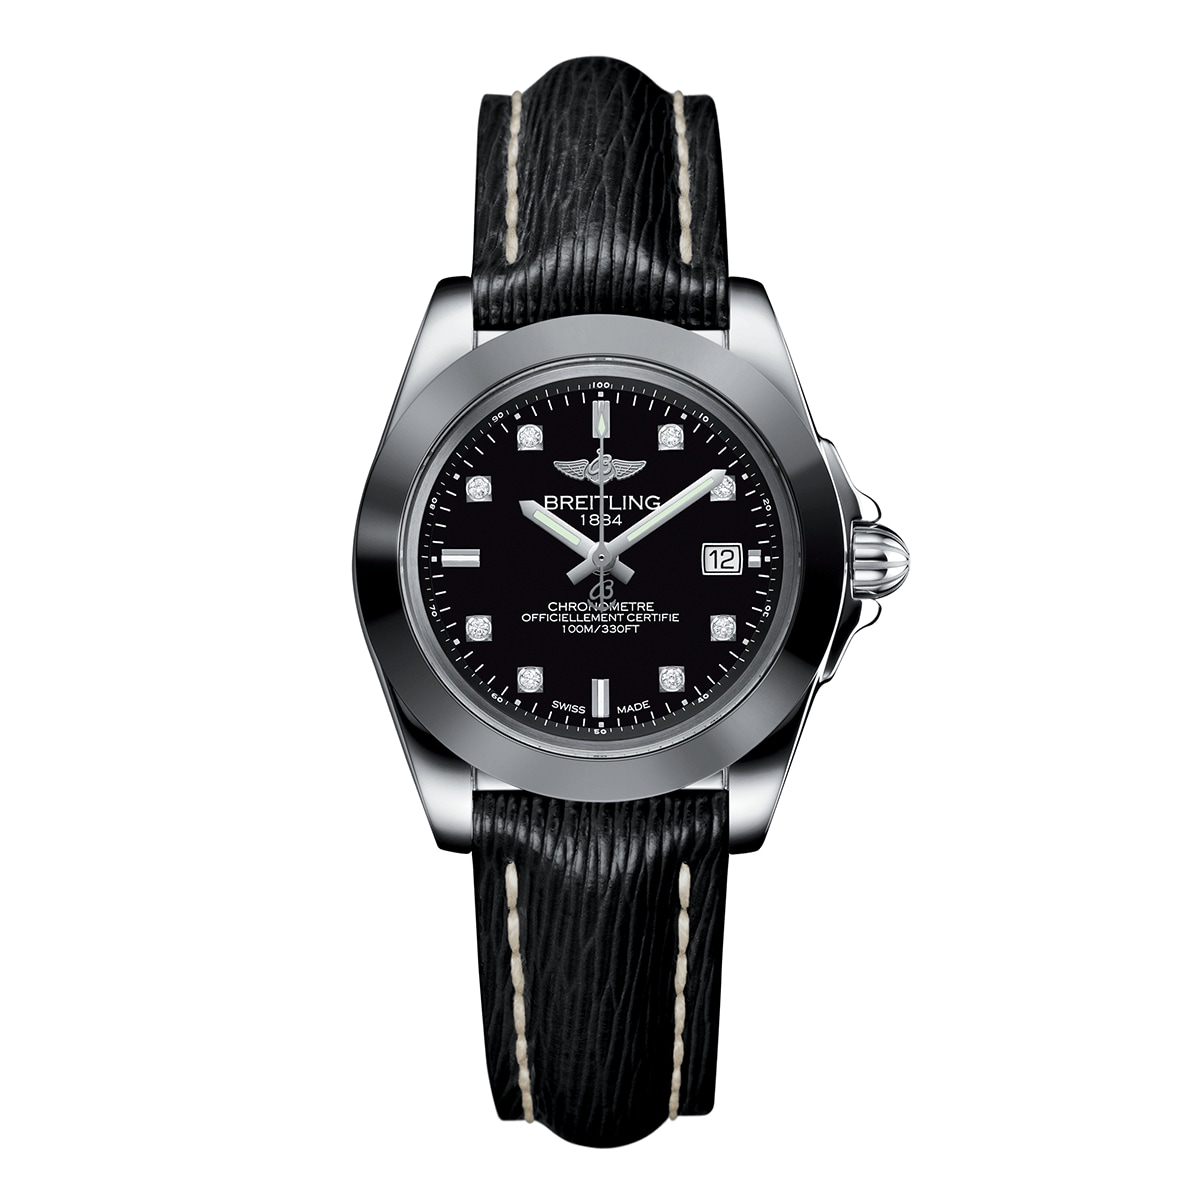 Galactic_32_Sleek_Steel-Trophy_Black_Diamond-W7133012-BF63-208X-A14BA.1